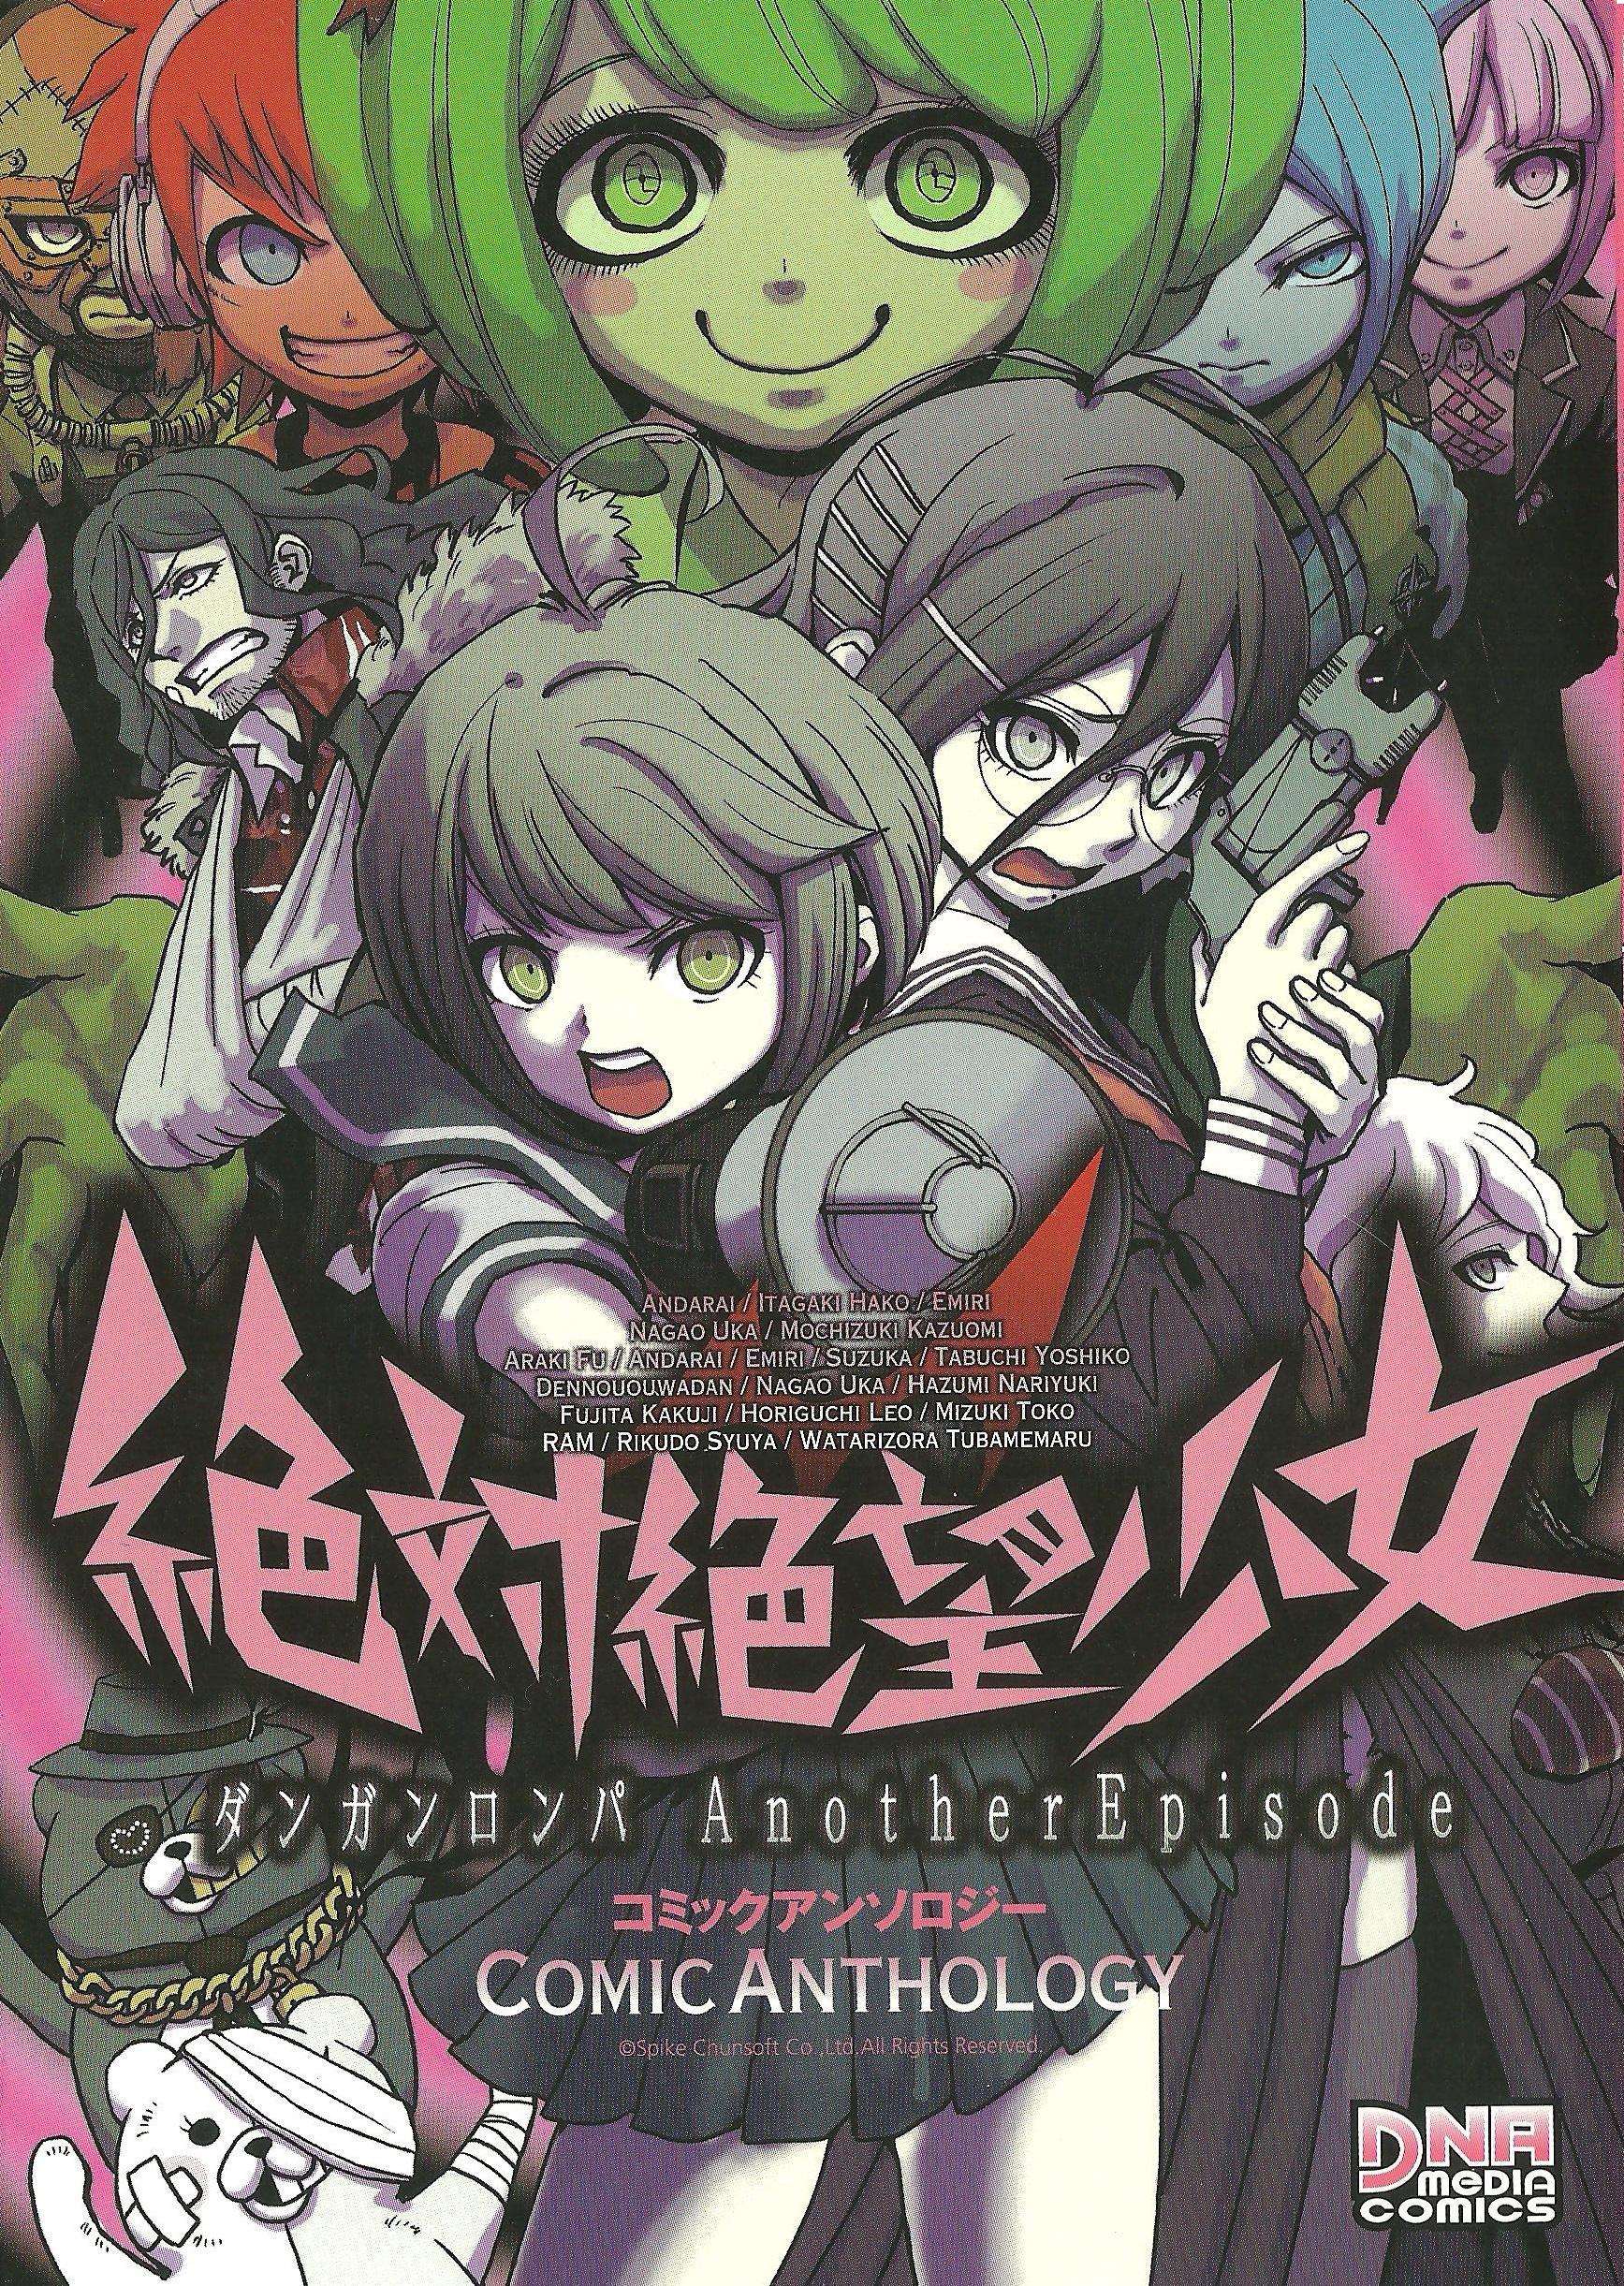 Manga Cover - Zettai Zetsubō Shōjo Danganronpa Another Episode Comic Anthology Volume 1 (Front) (Japanese).jpg